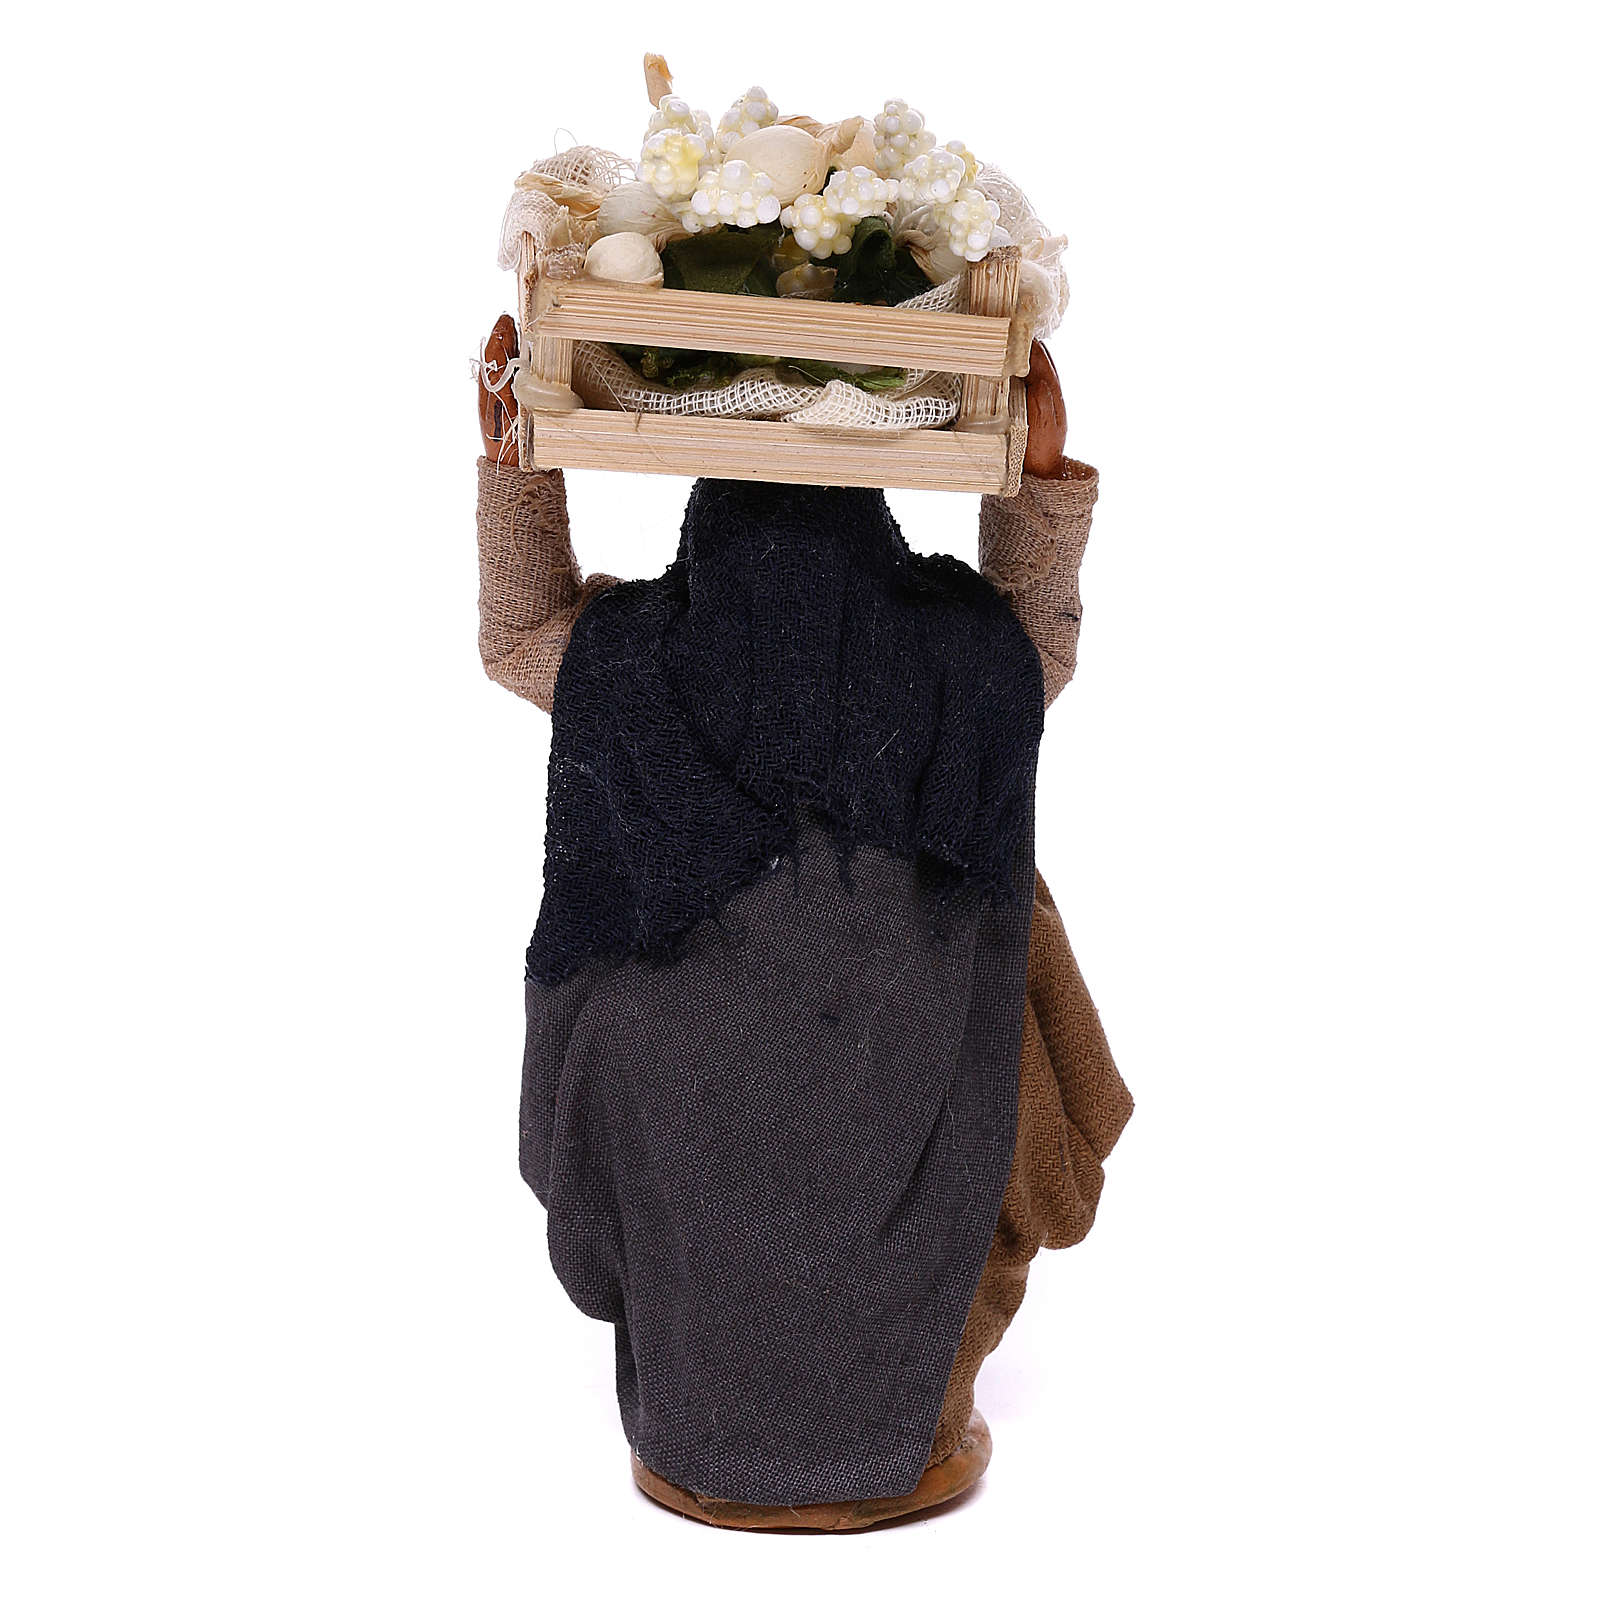 Woman carrying flowers box on head 10cm, Nativity figurine 4